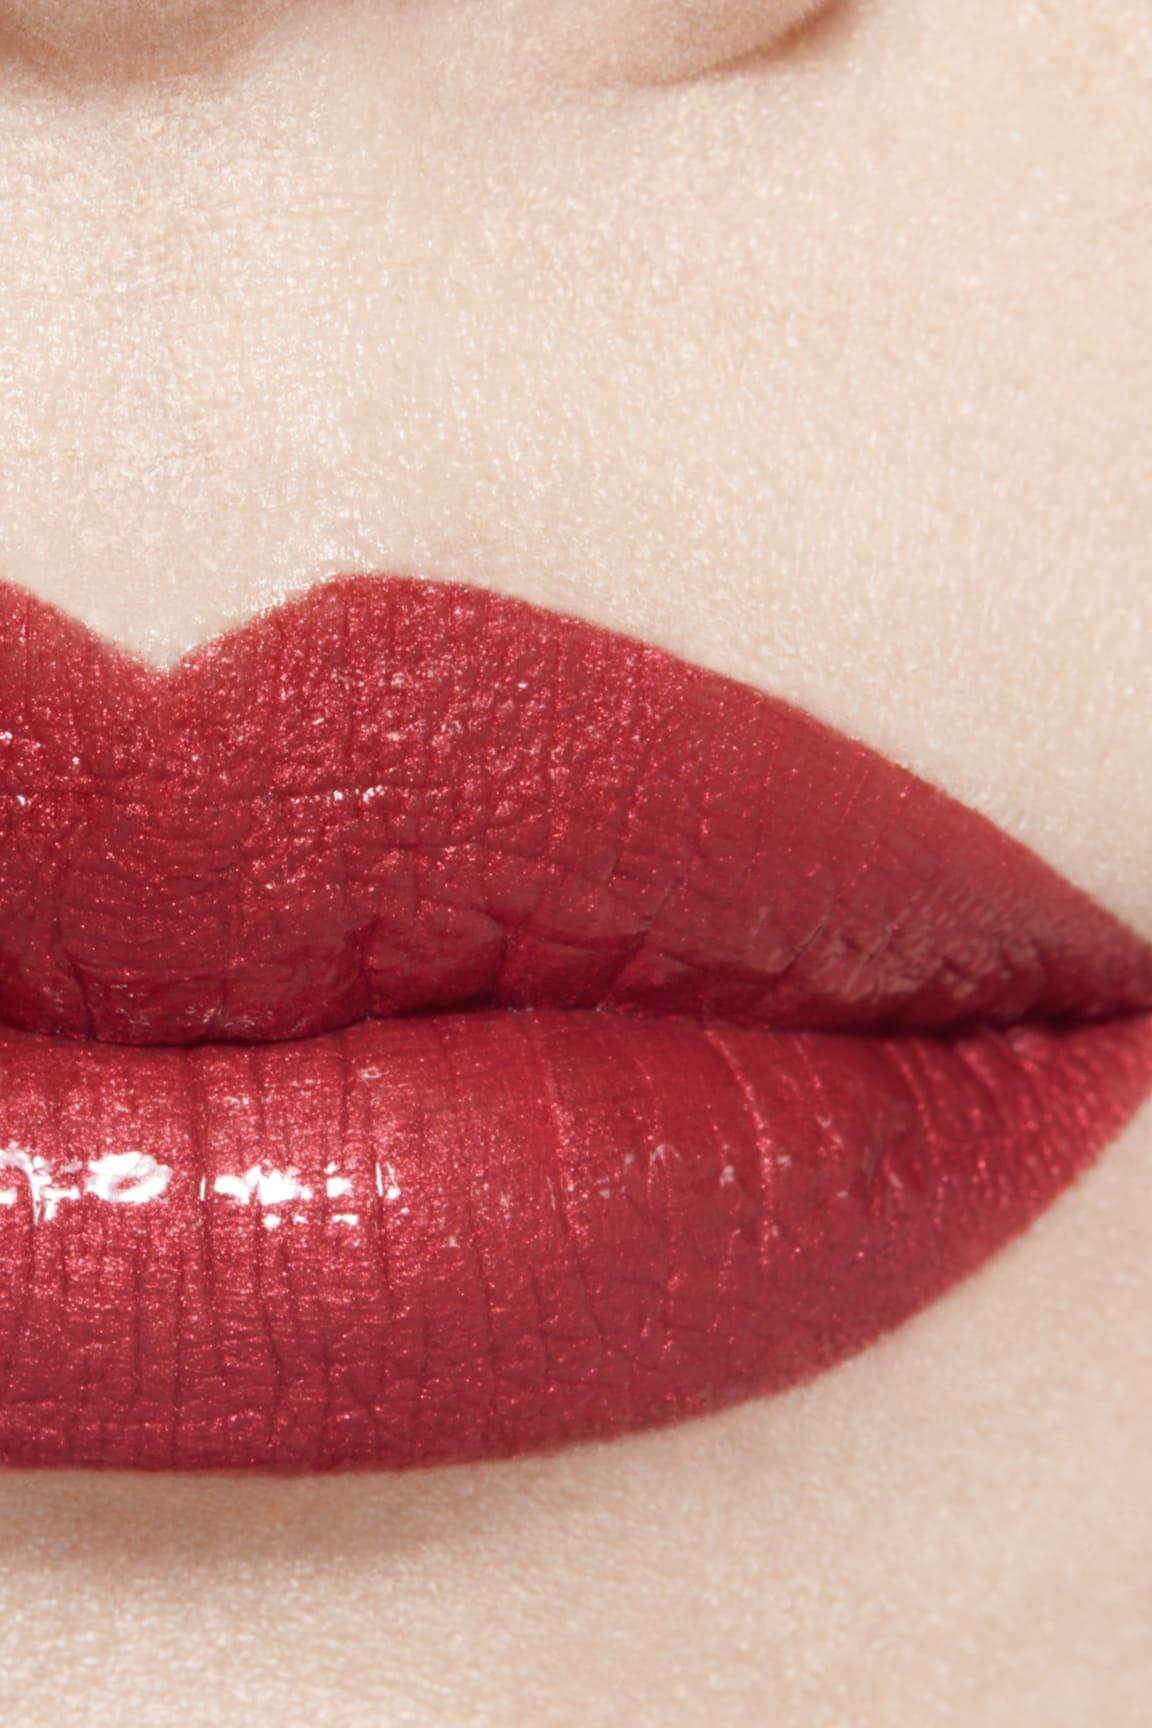 Visuel d'application maquillage 1 - ROUGE ALLURE LAQUE 71 - MYTHE